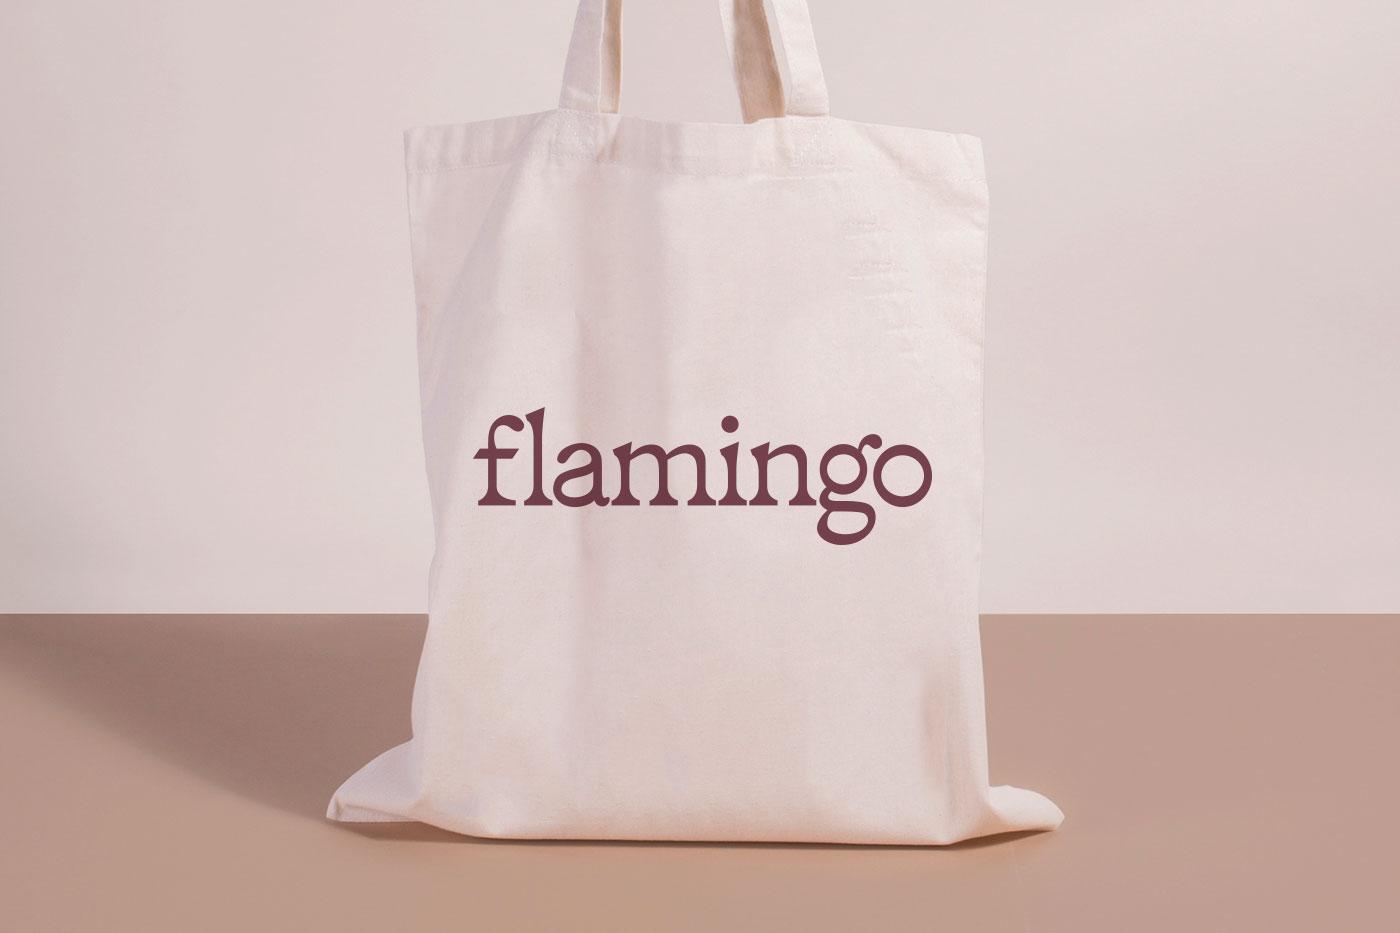 Flamingo_tote